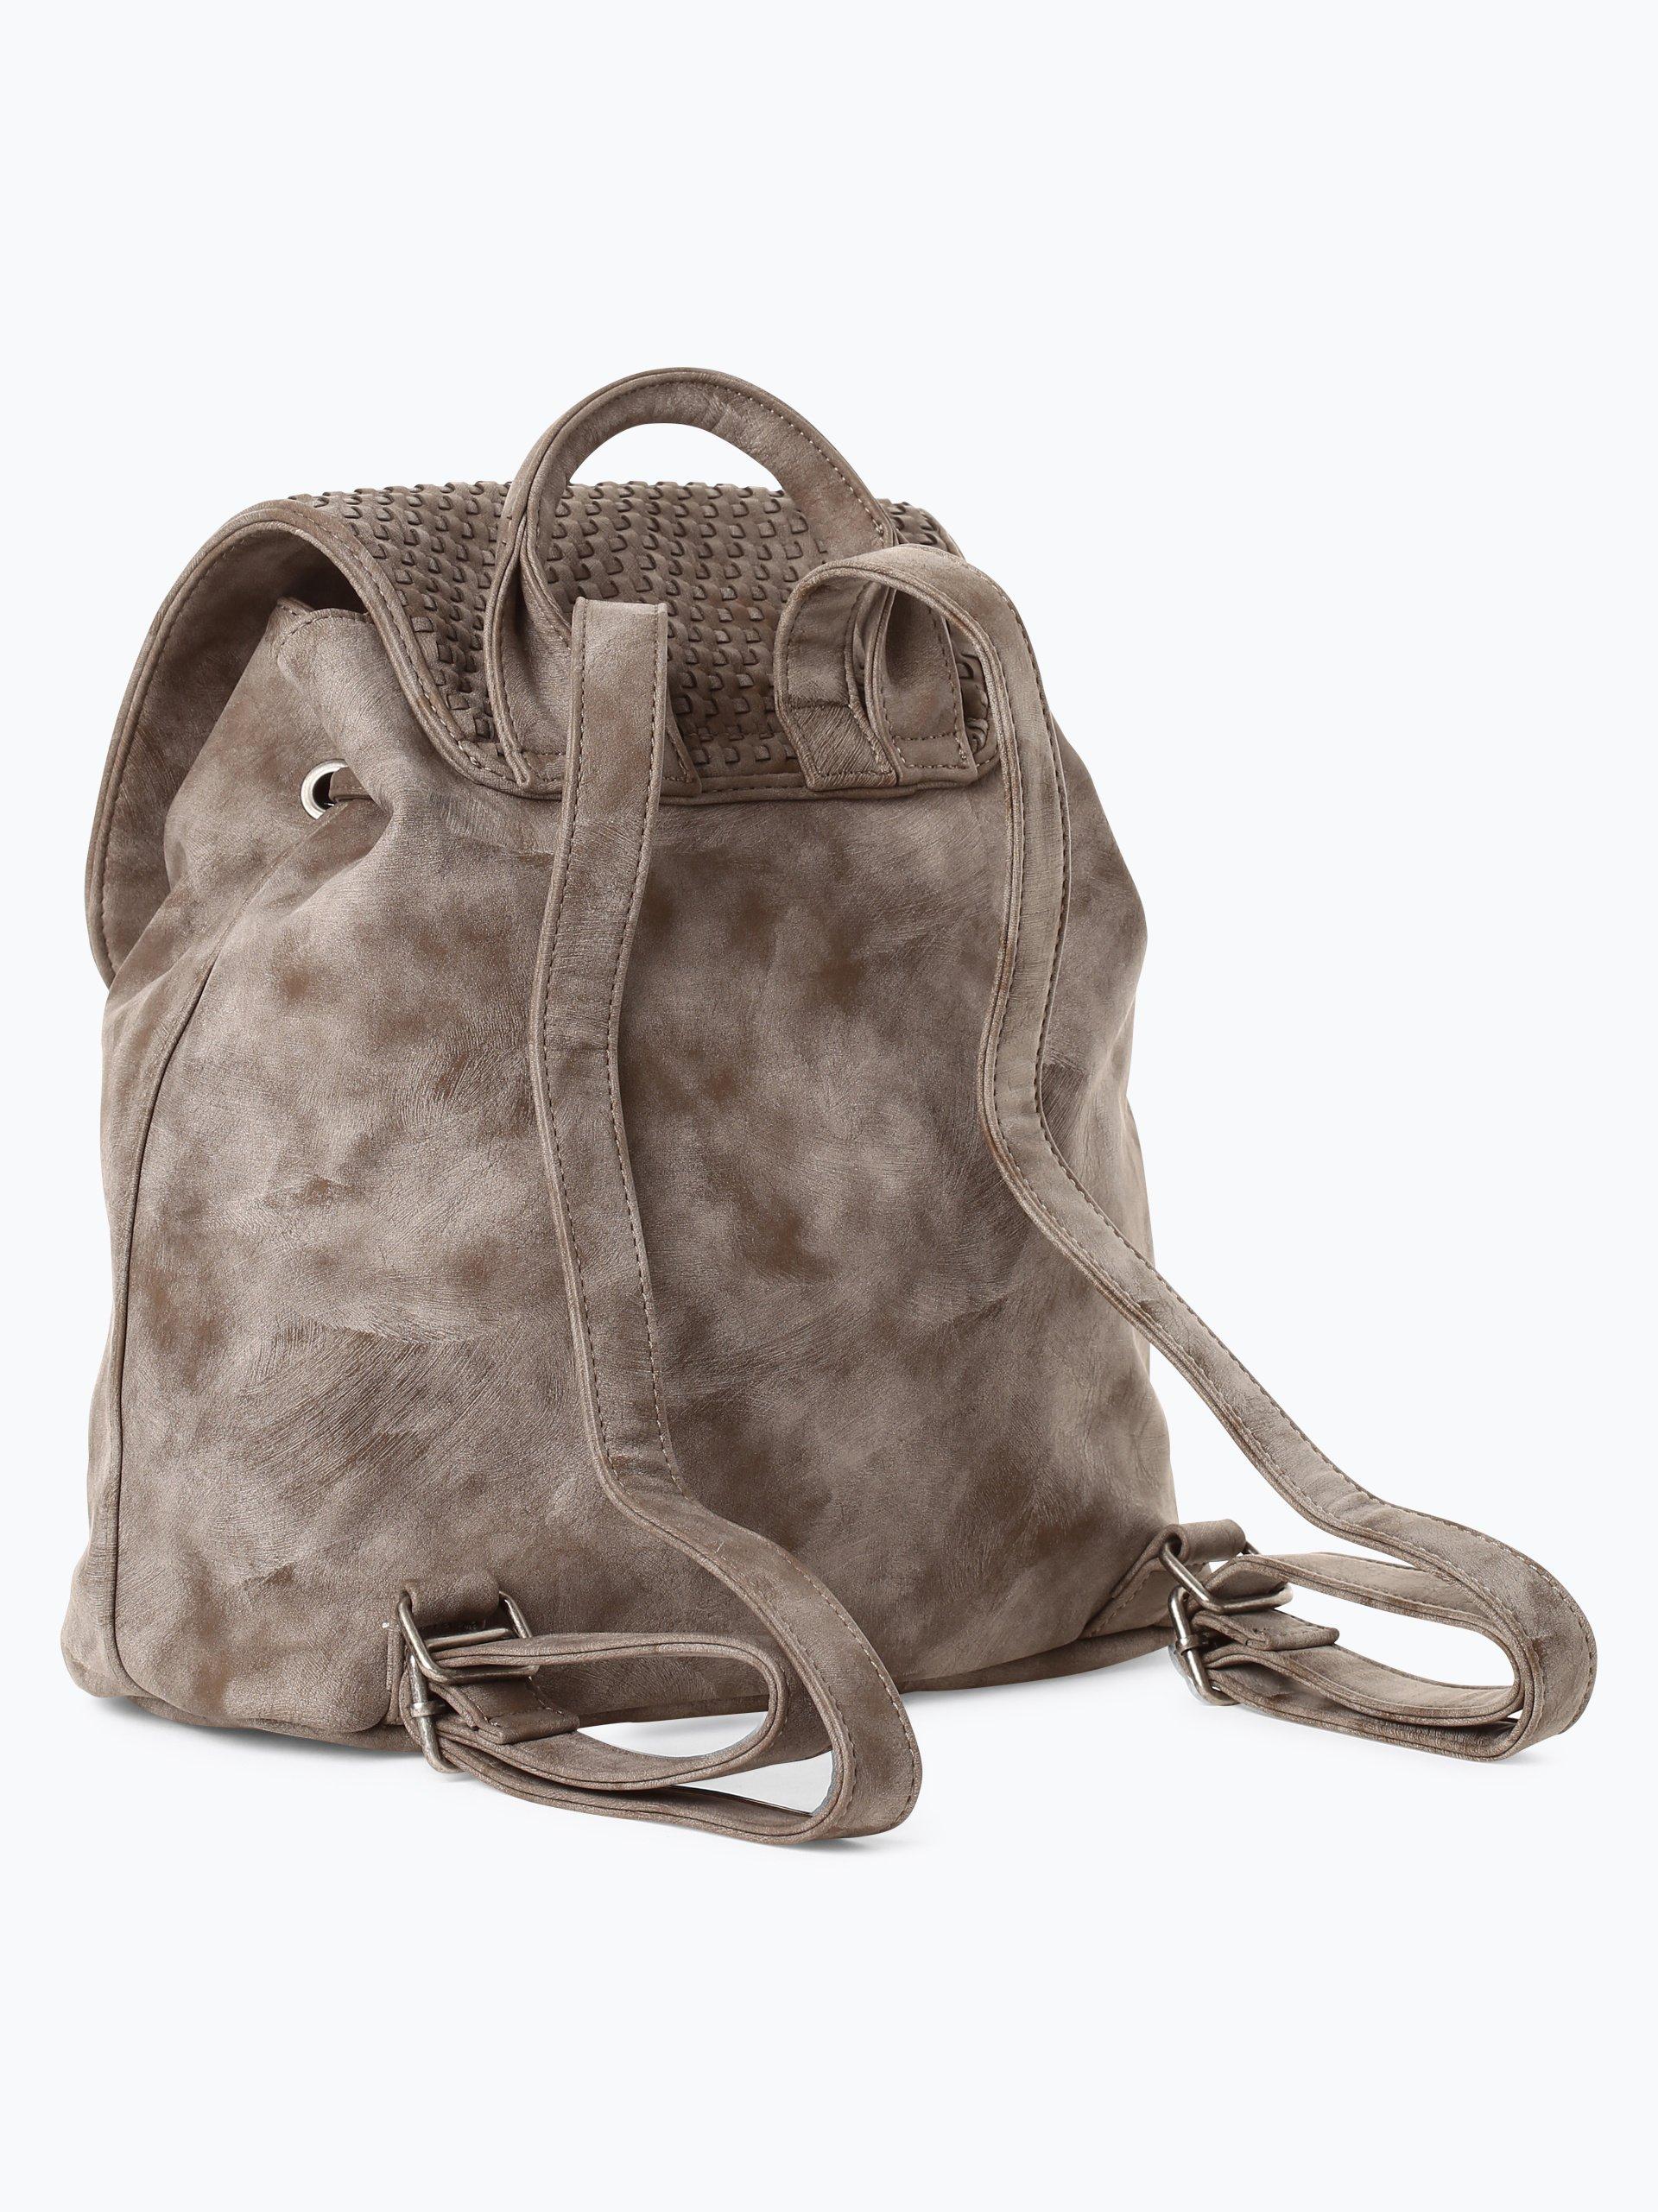 fritzi aus preussen damen rucksack cora khaki taupe uni online kaufen vangraaf com. Black Bedroom Furniture Sets. Home Design Ideas